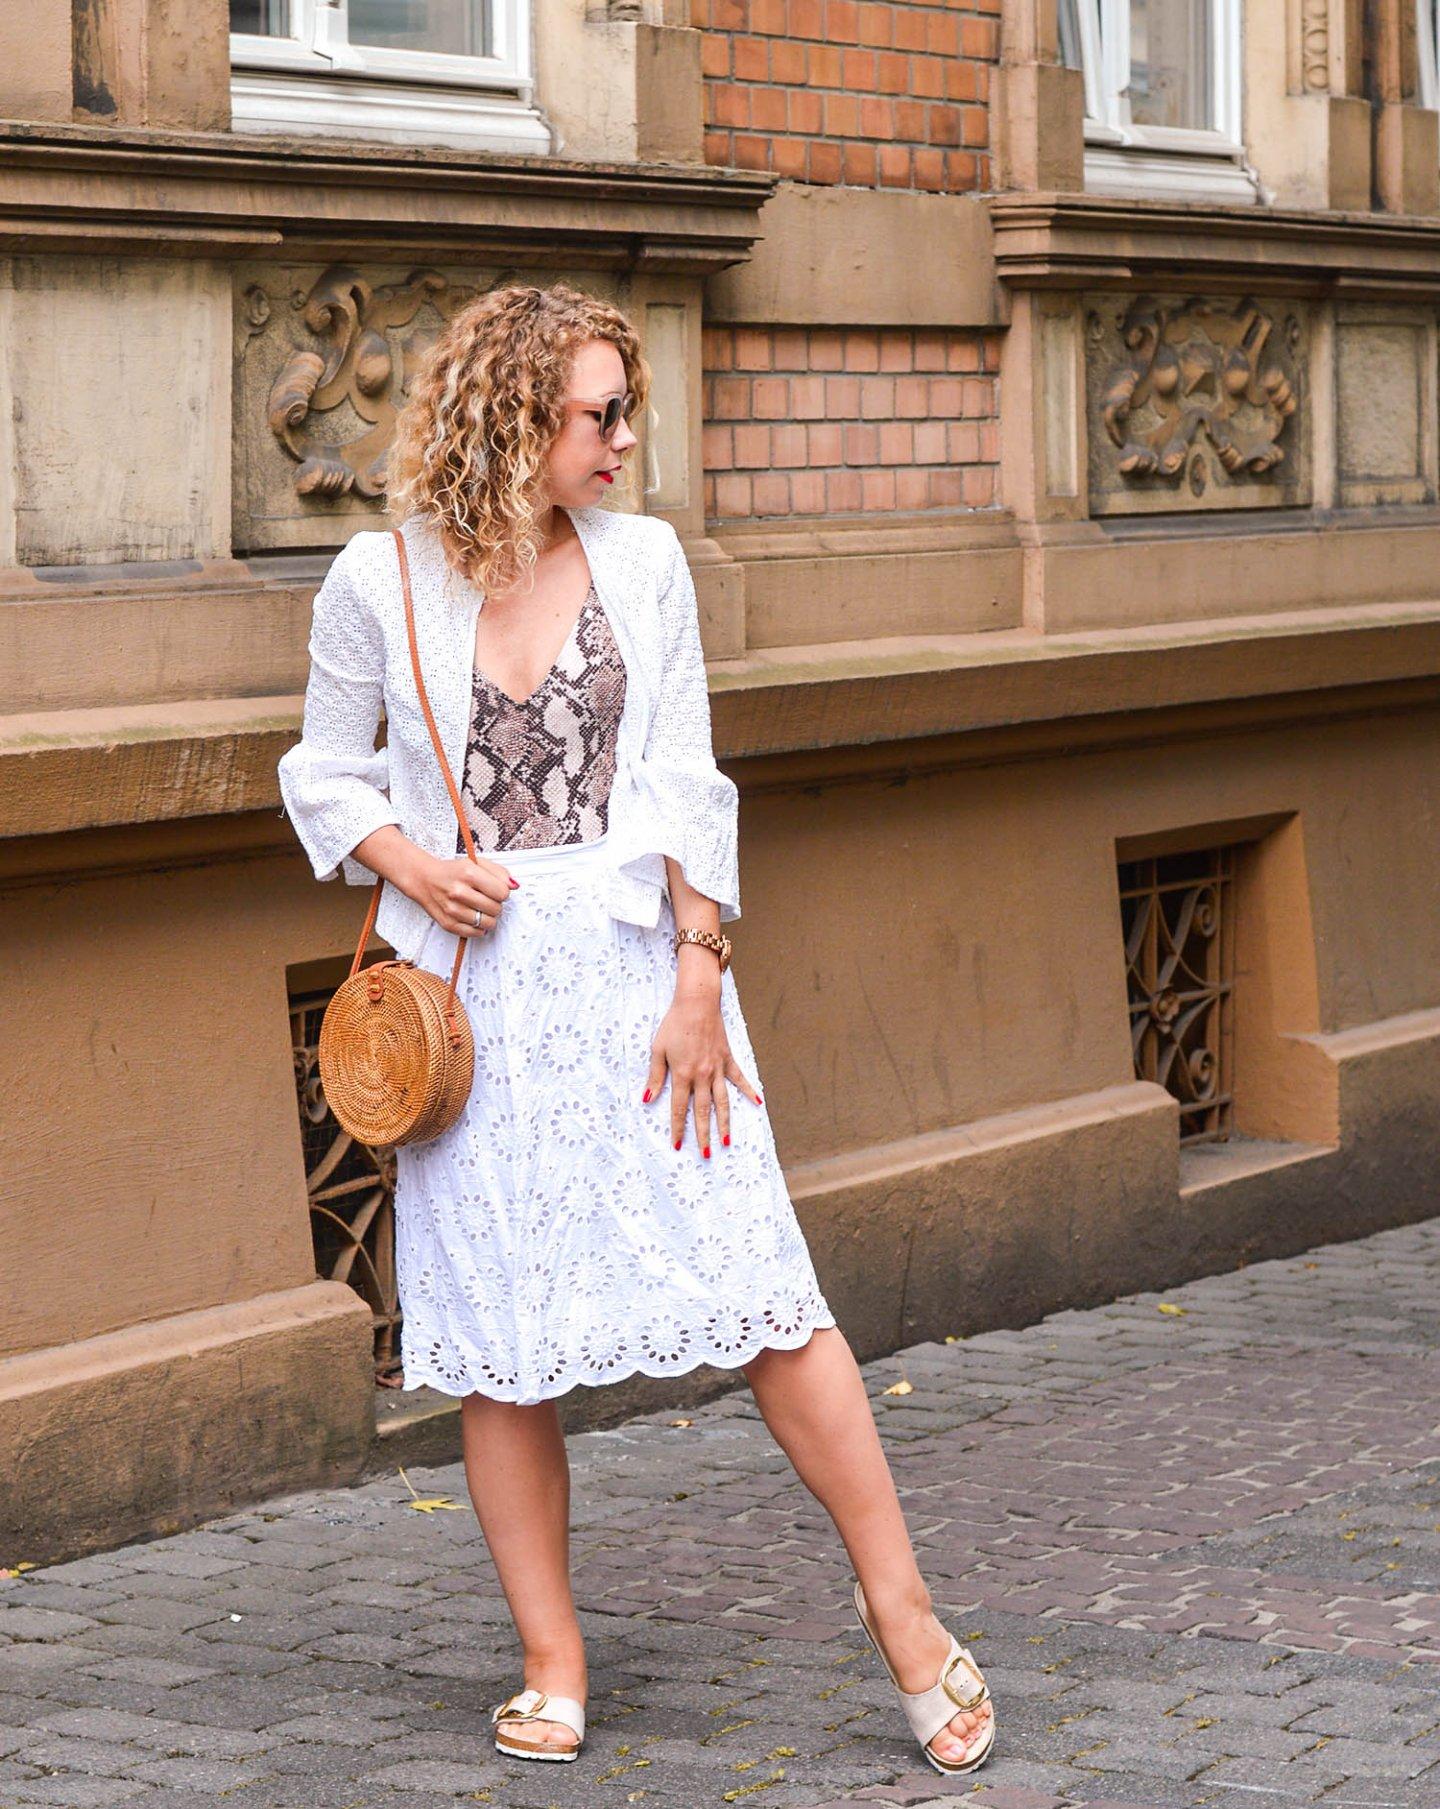 Birkenstock Madrid big buckle outfit